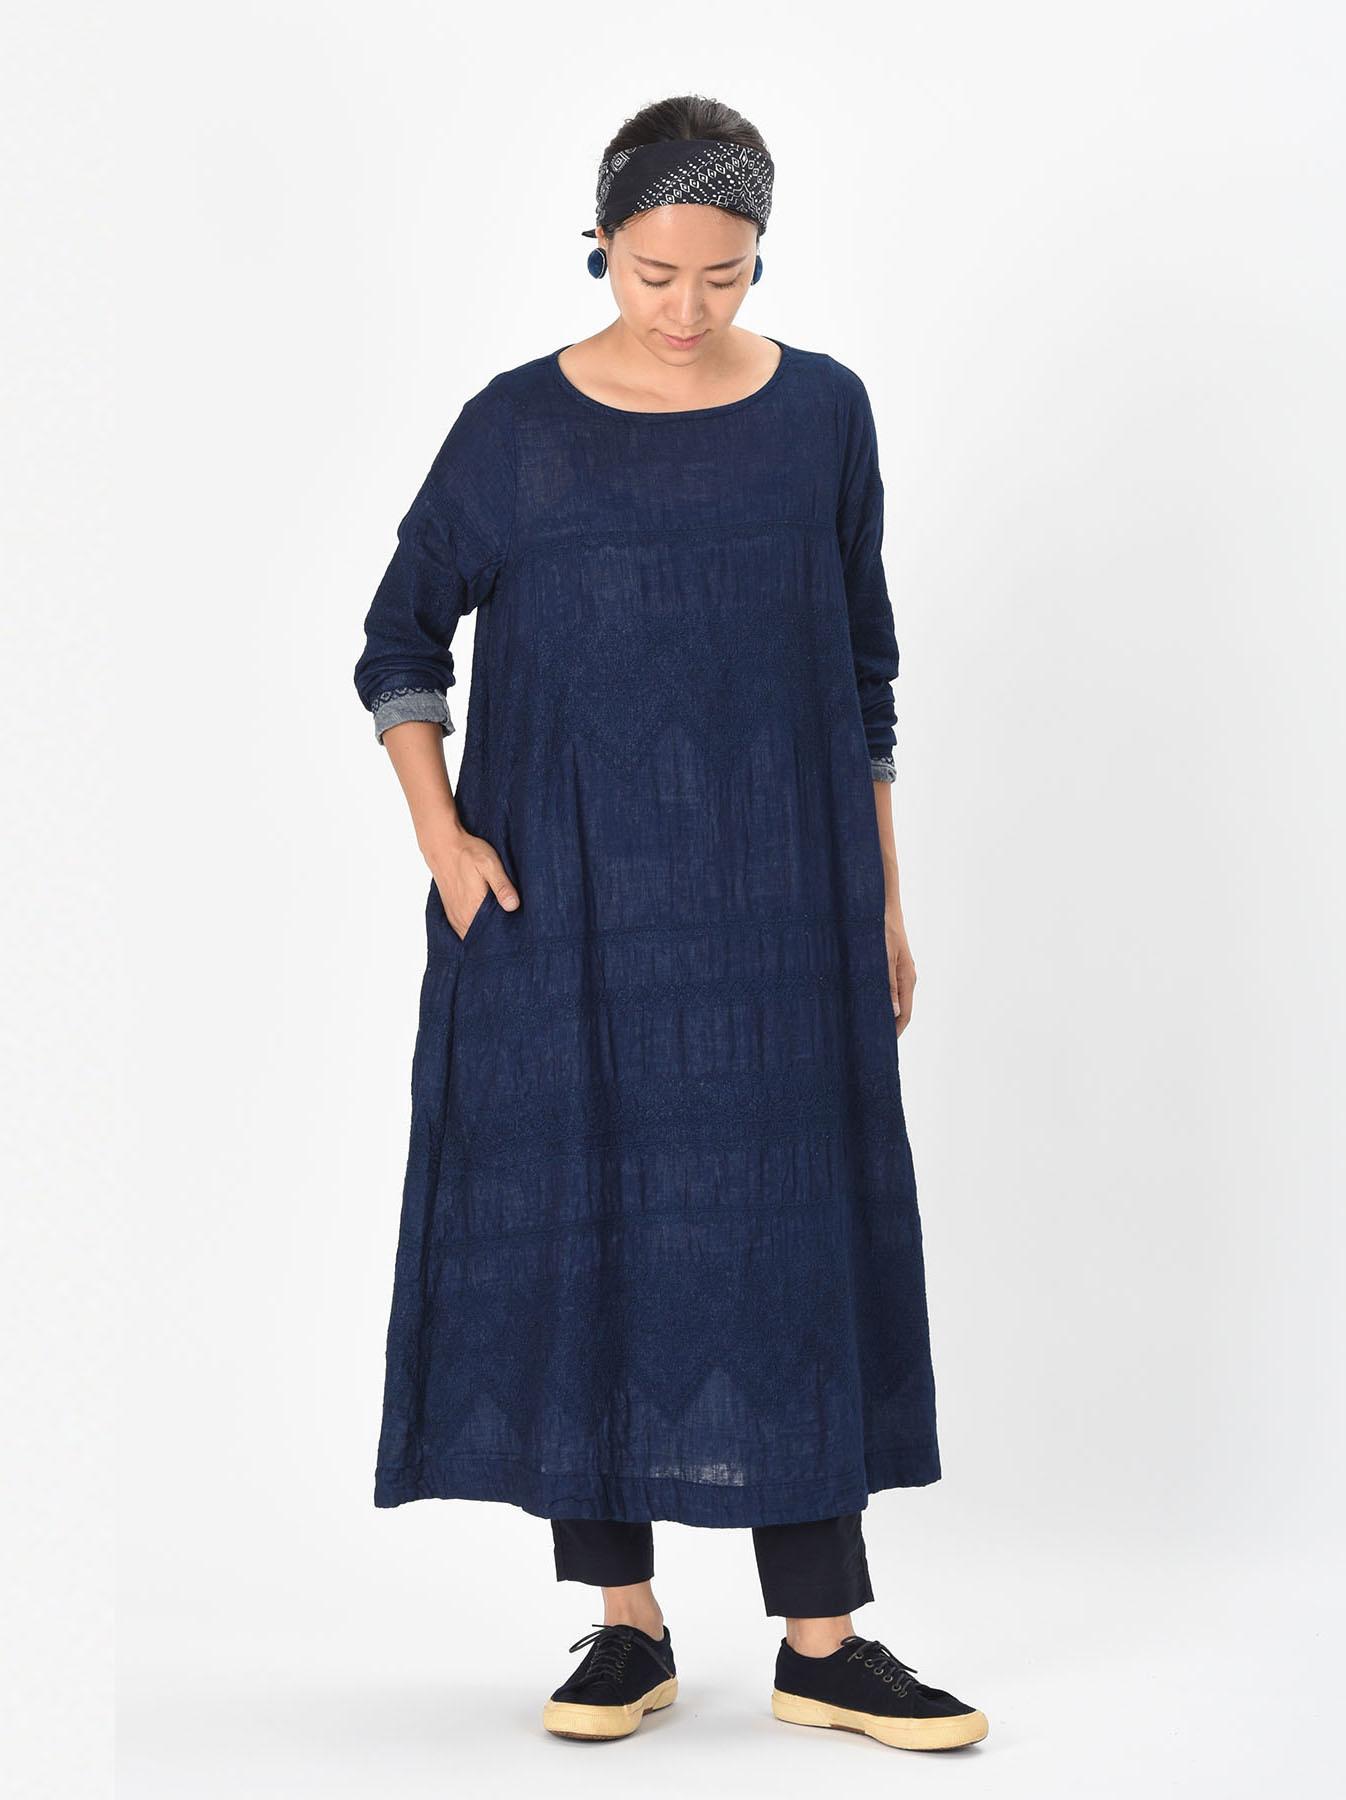 Indigo Double Cloth Lace Embroidery Dress-2